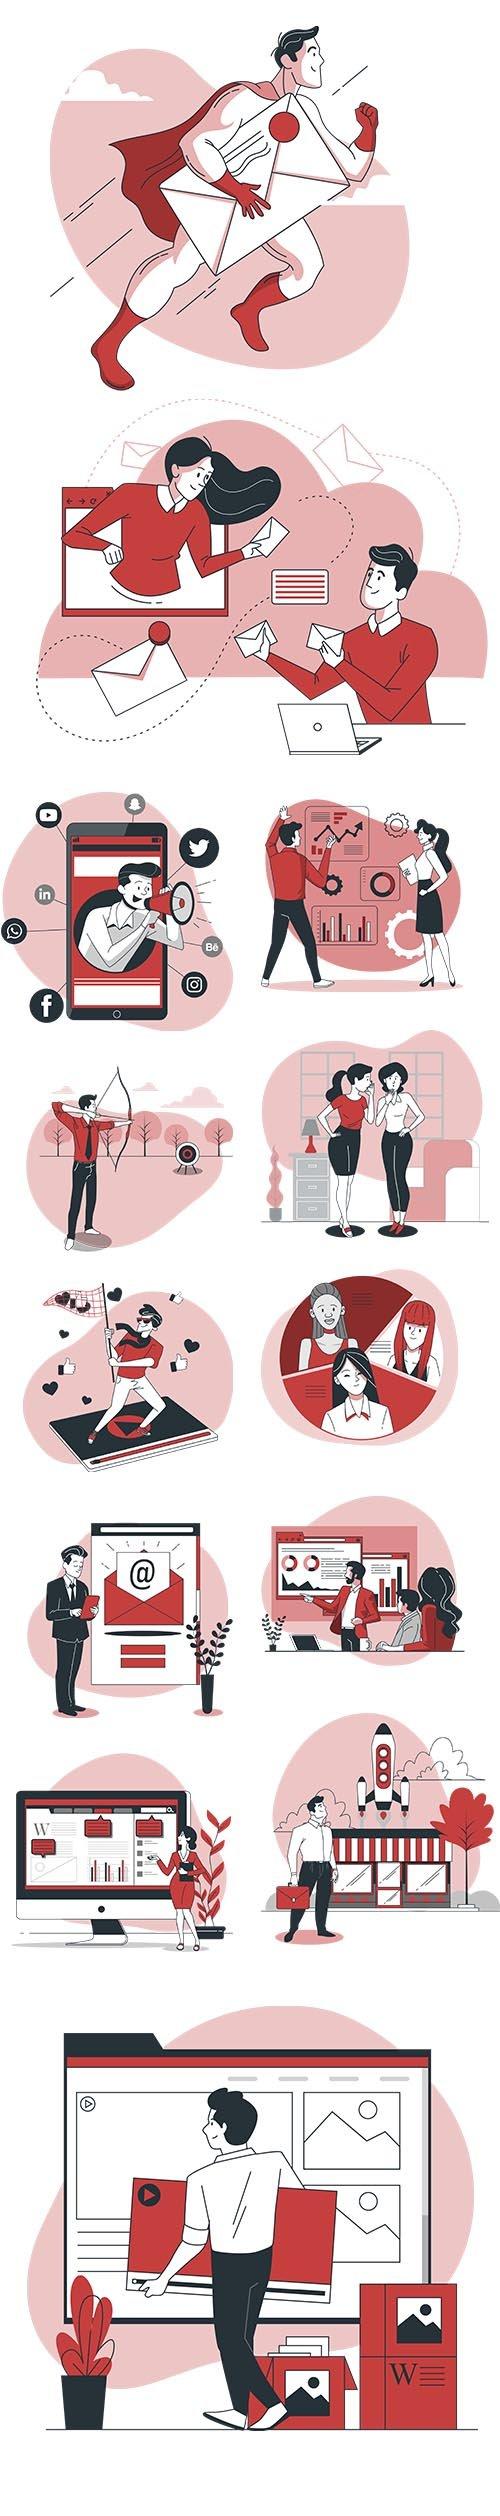 Vector Illustrations Marketing Concept